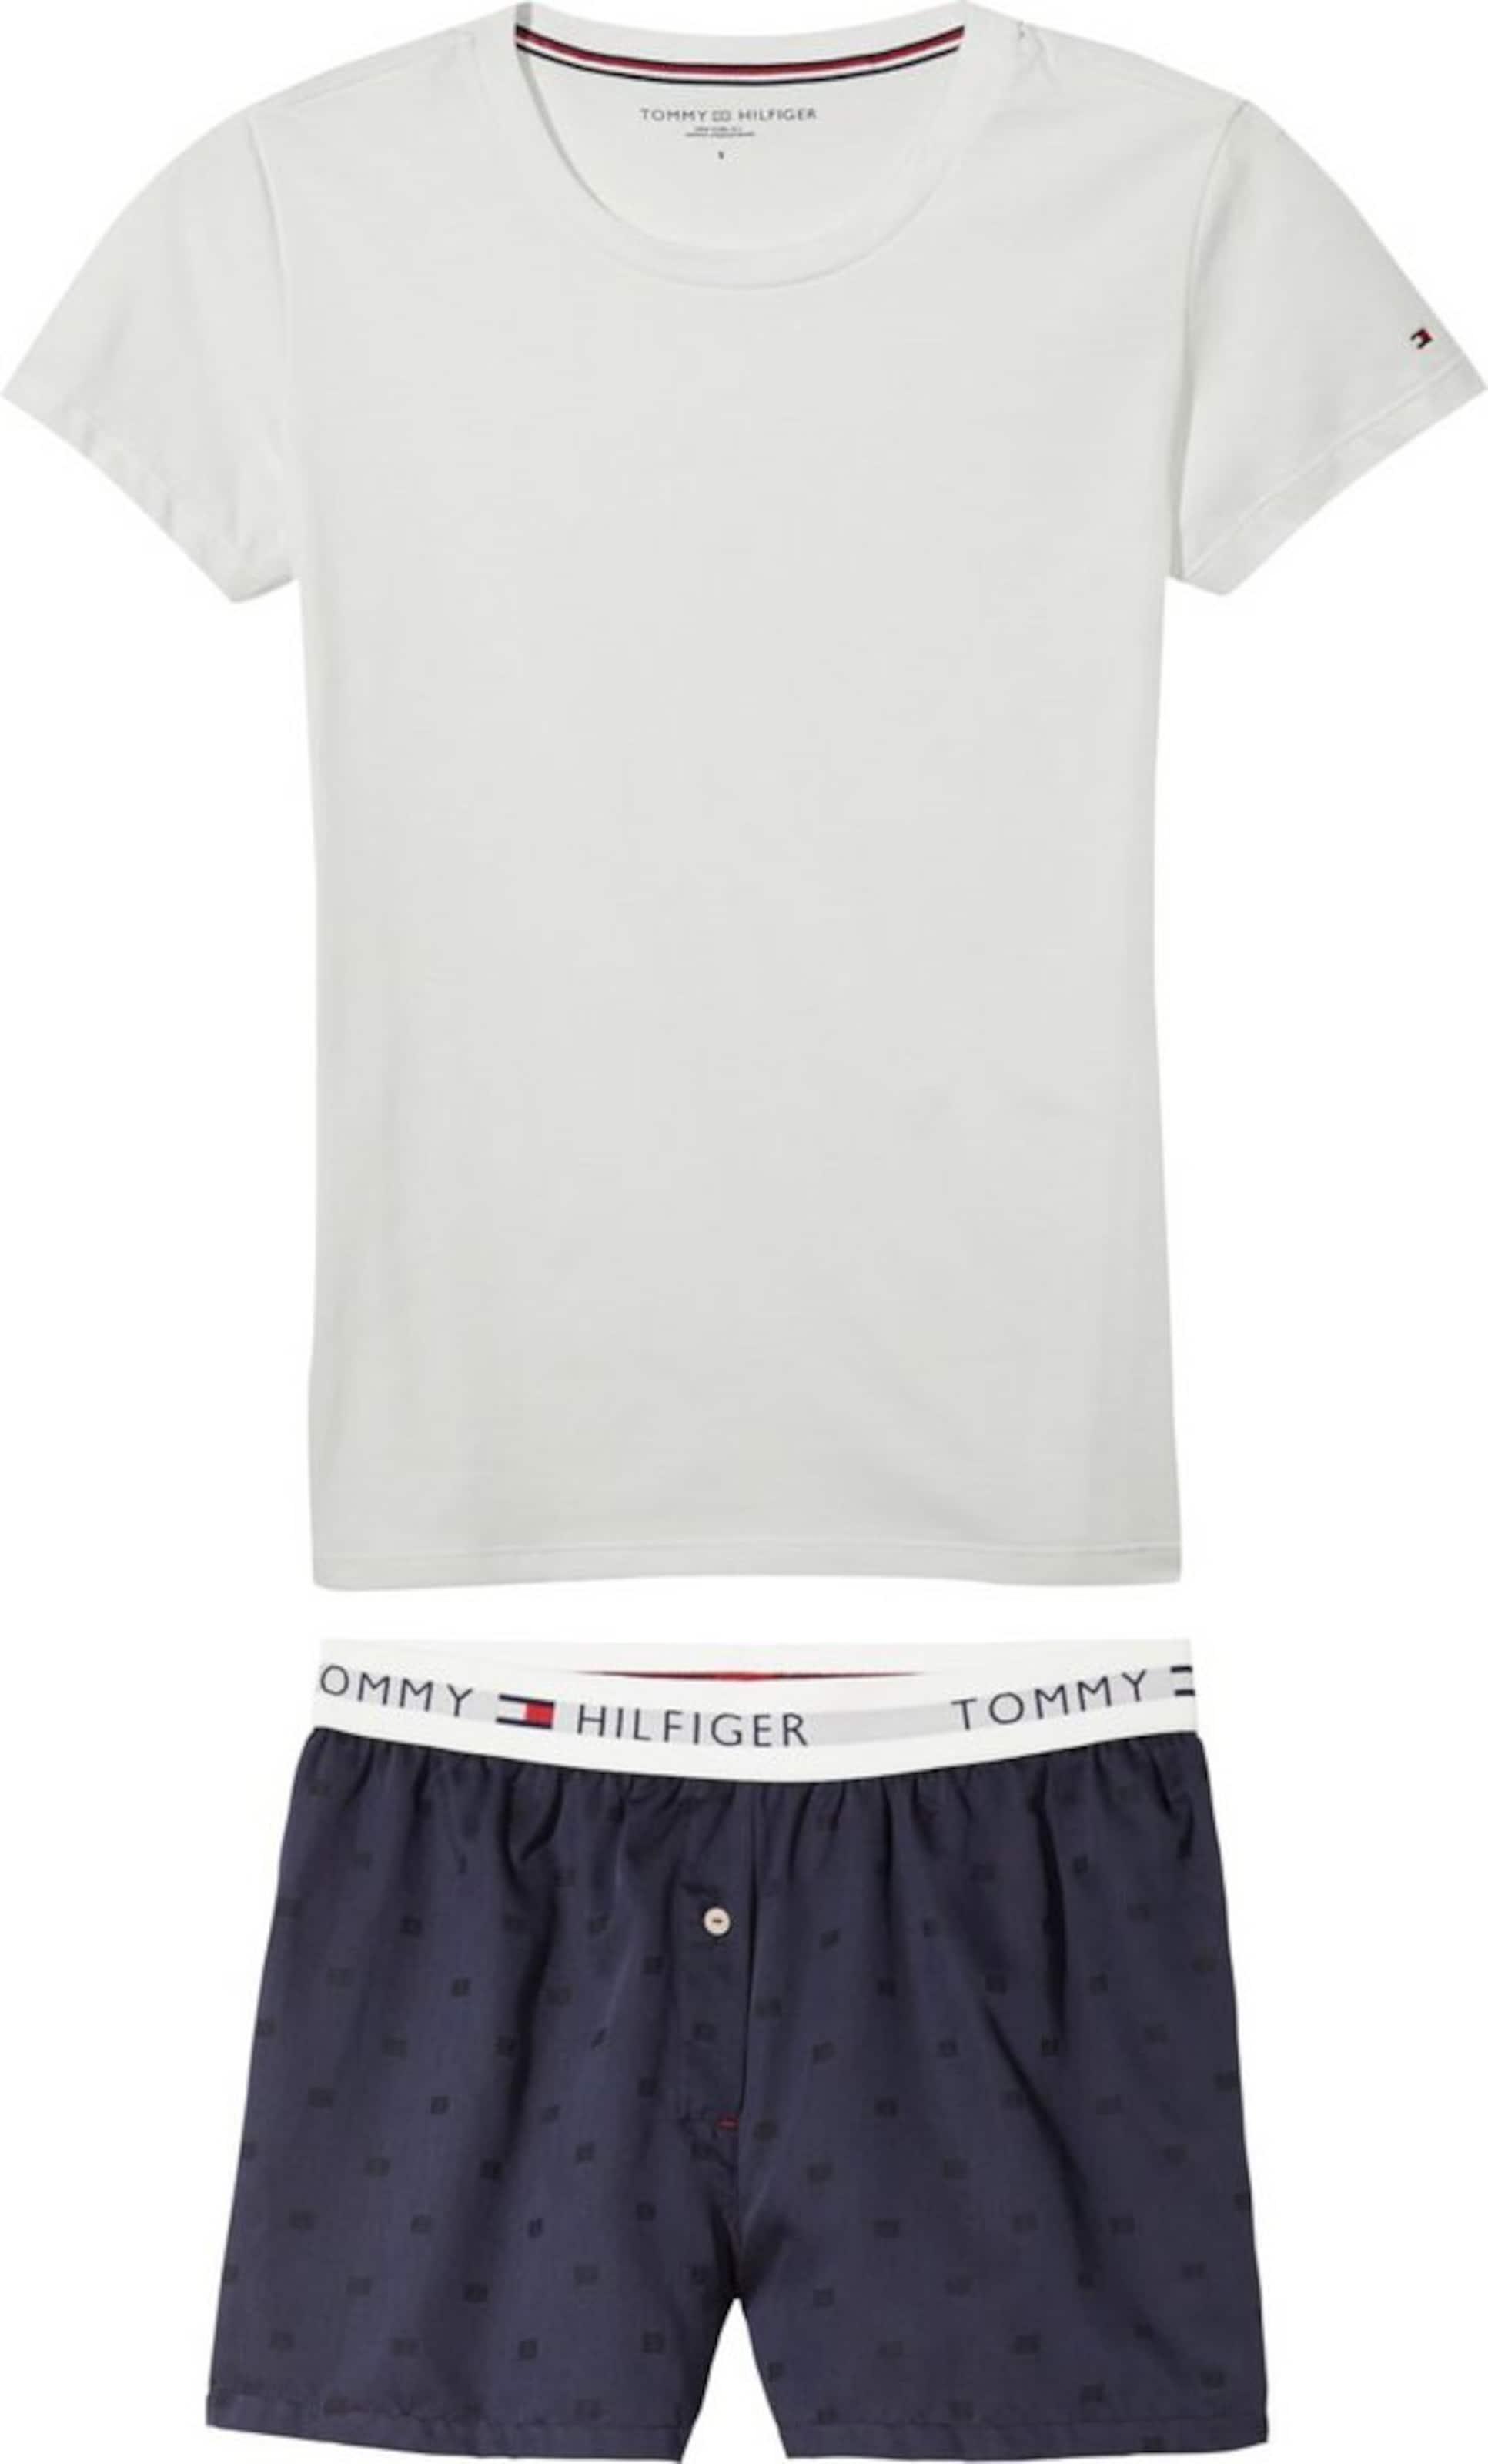 TOMMY HILFIGER Pyjama Billig Verkauf Fabrikverkauf Bester Großhandel VmRacxSh